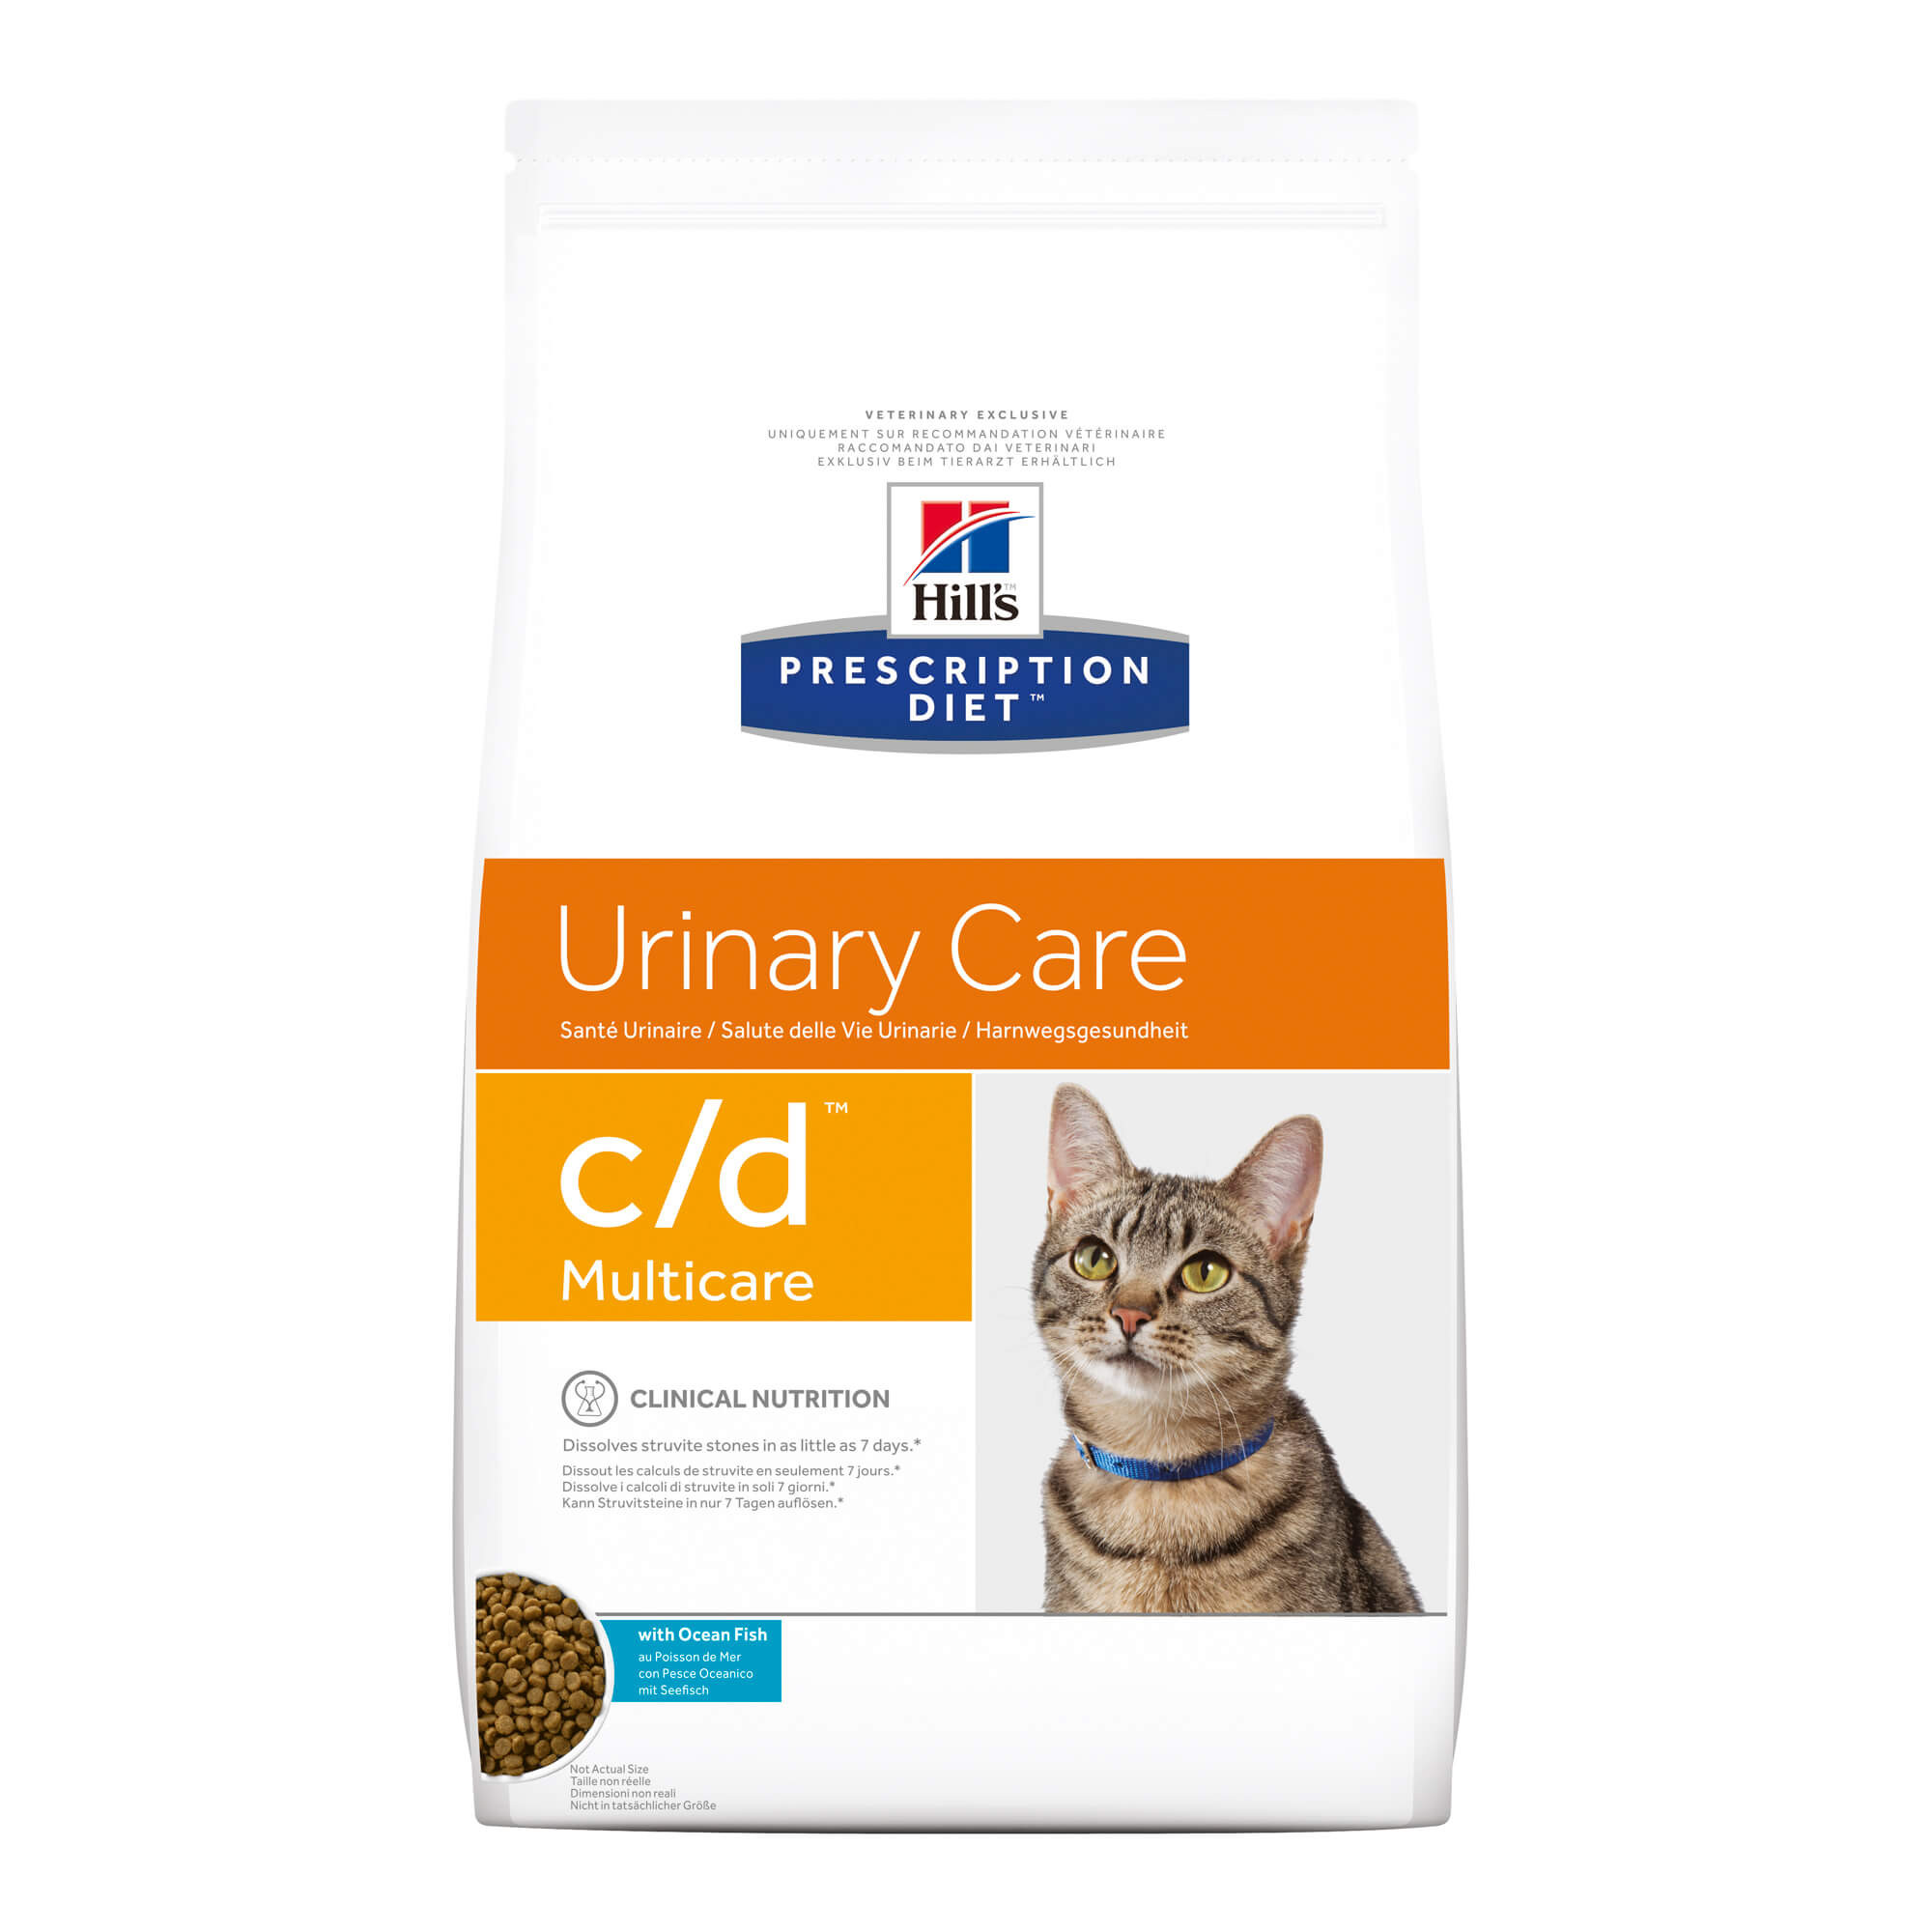 Hill's Prescription C/D Multicare Urinary Care Katzenfutter mit Fisch